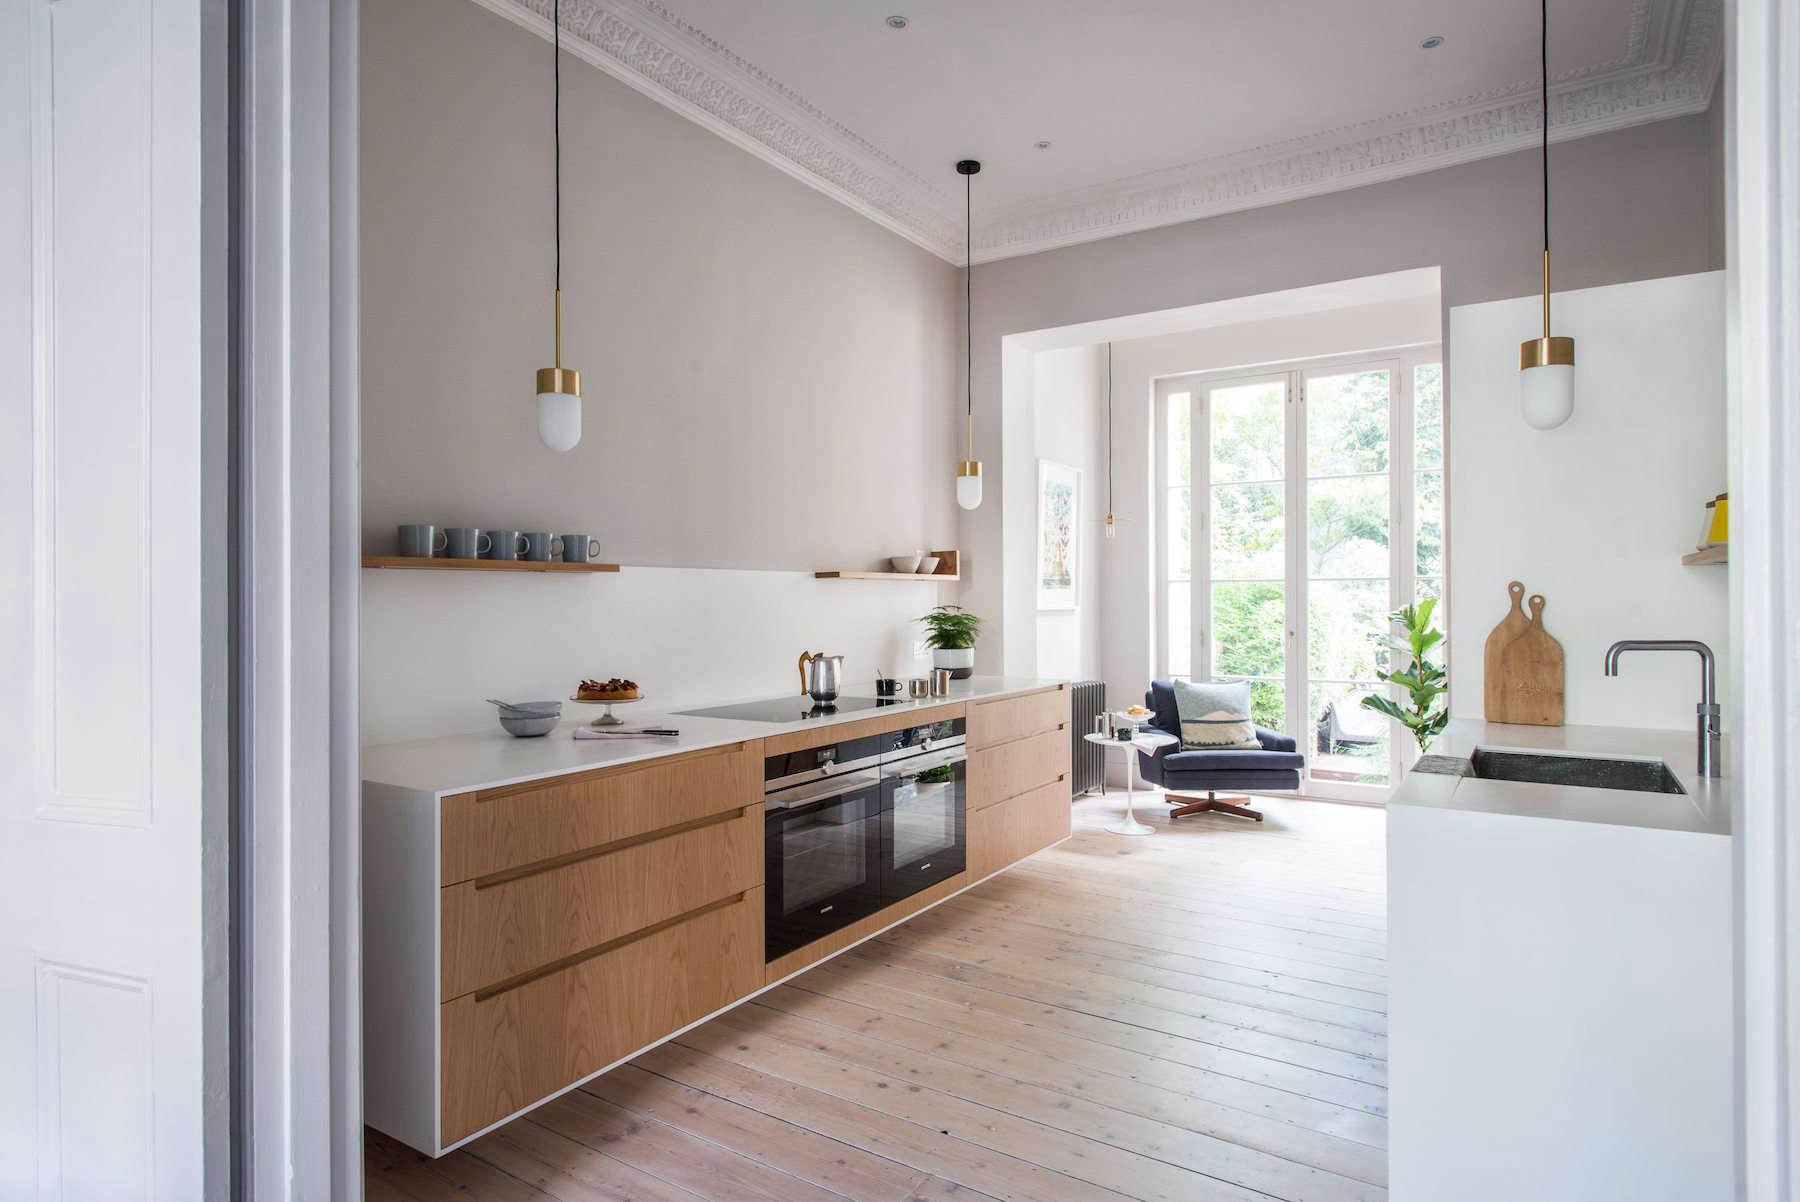 Kitchen Of The Week A Minimalist Galley Kitchen In A